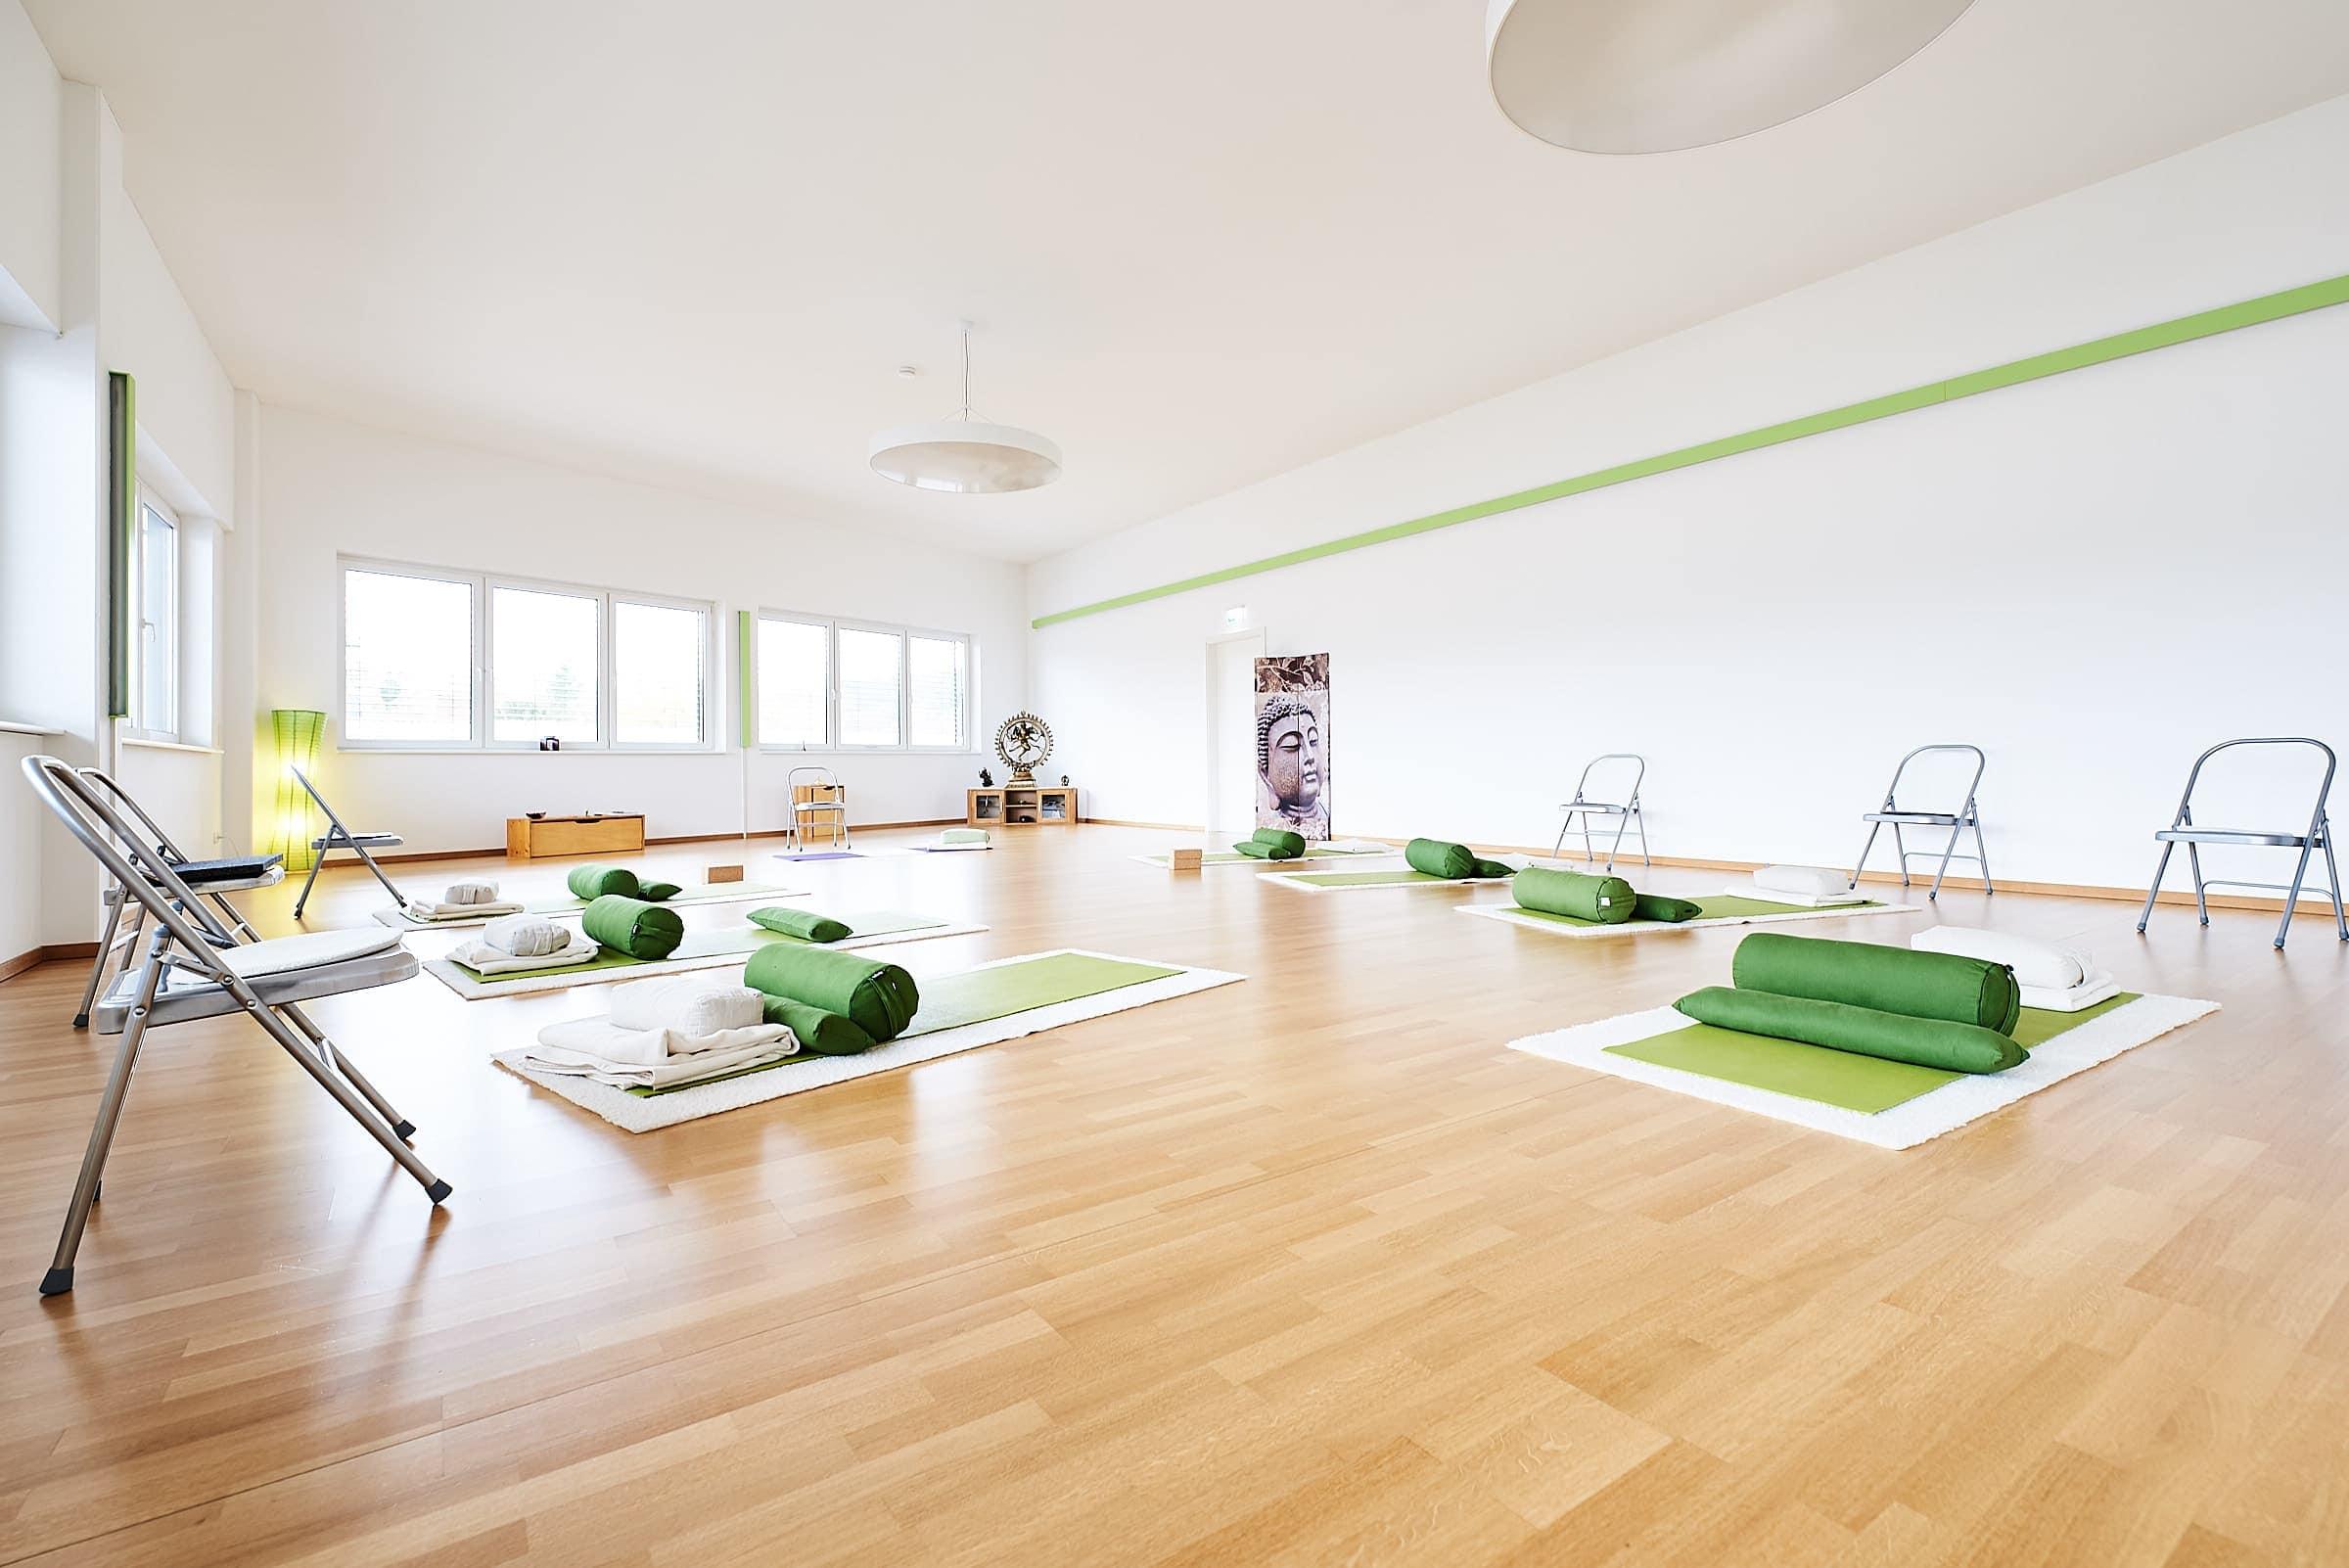 Firmenfotograf Trier Interieur Yogaschule Ultraweitwinkel